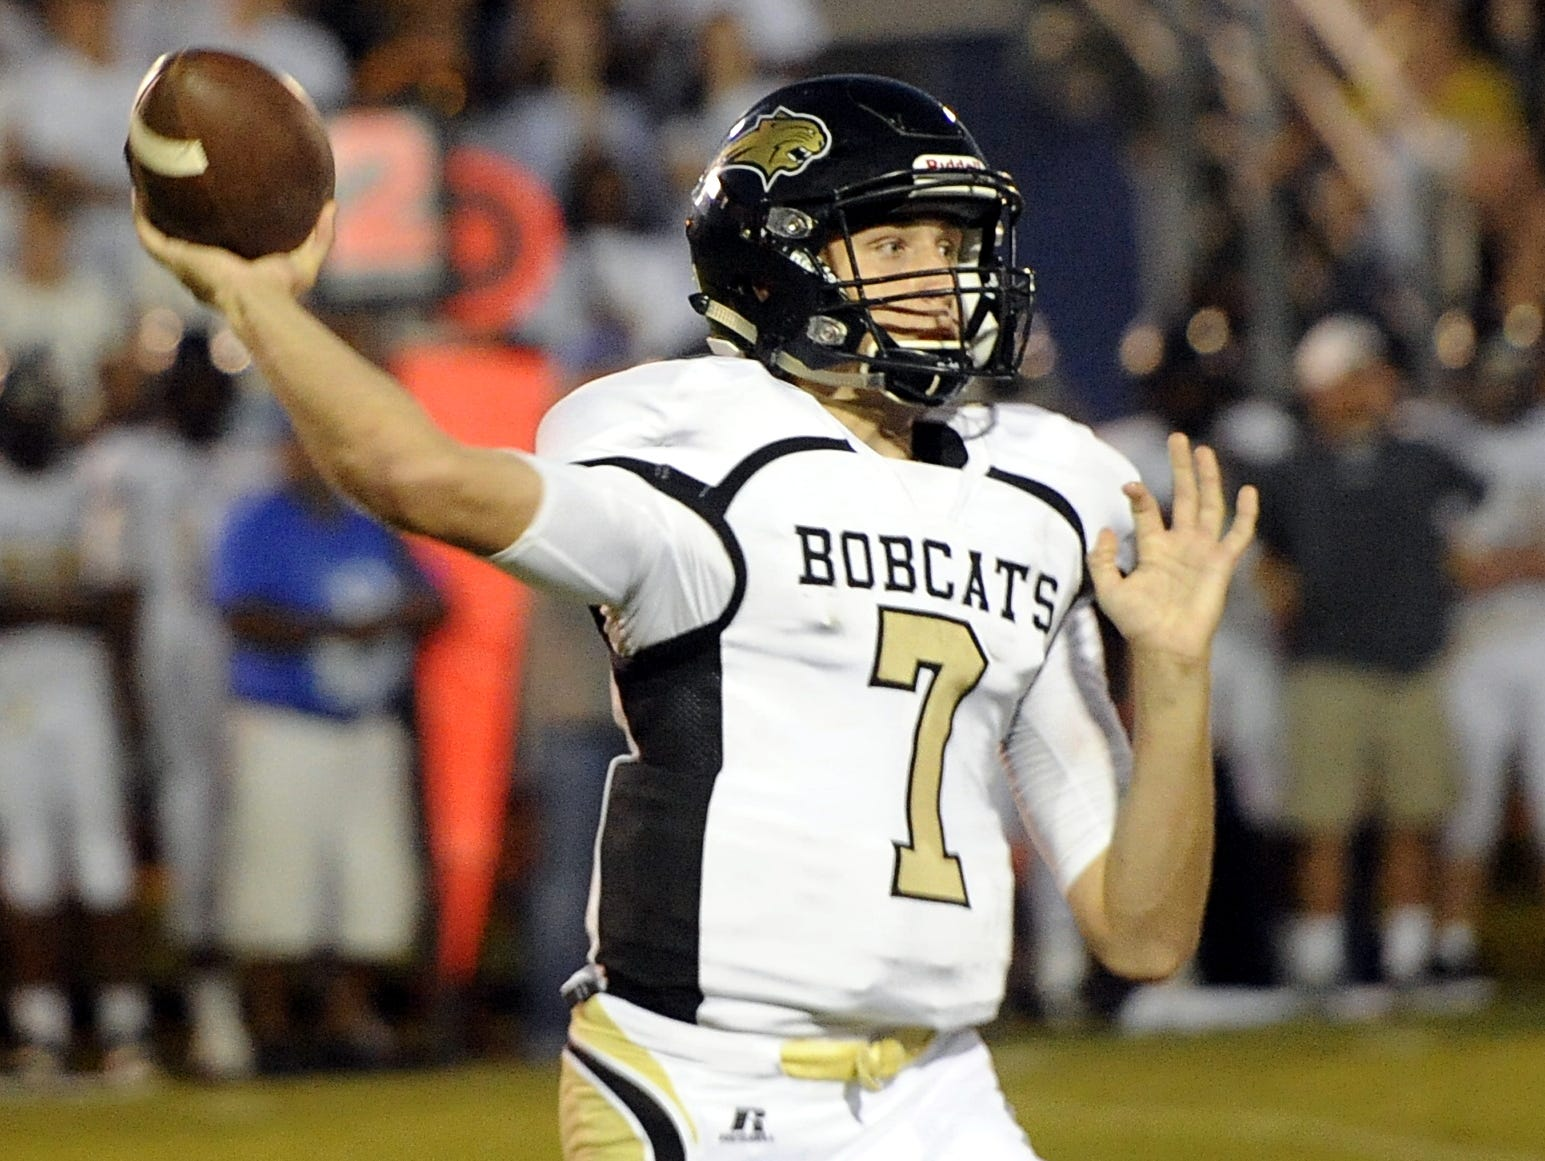 Giles County junior quarterback John Bachus